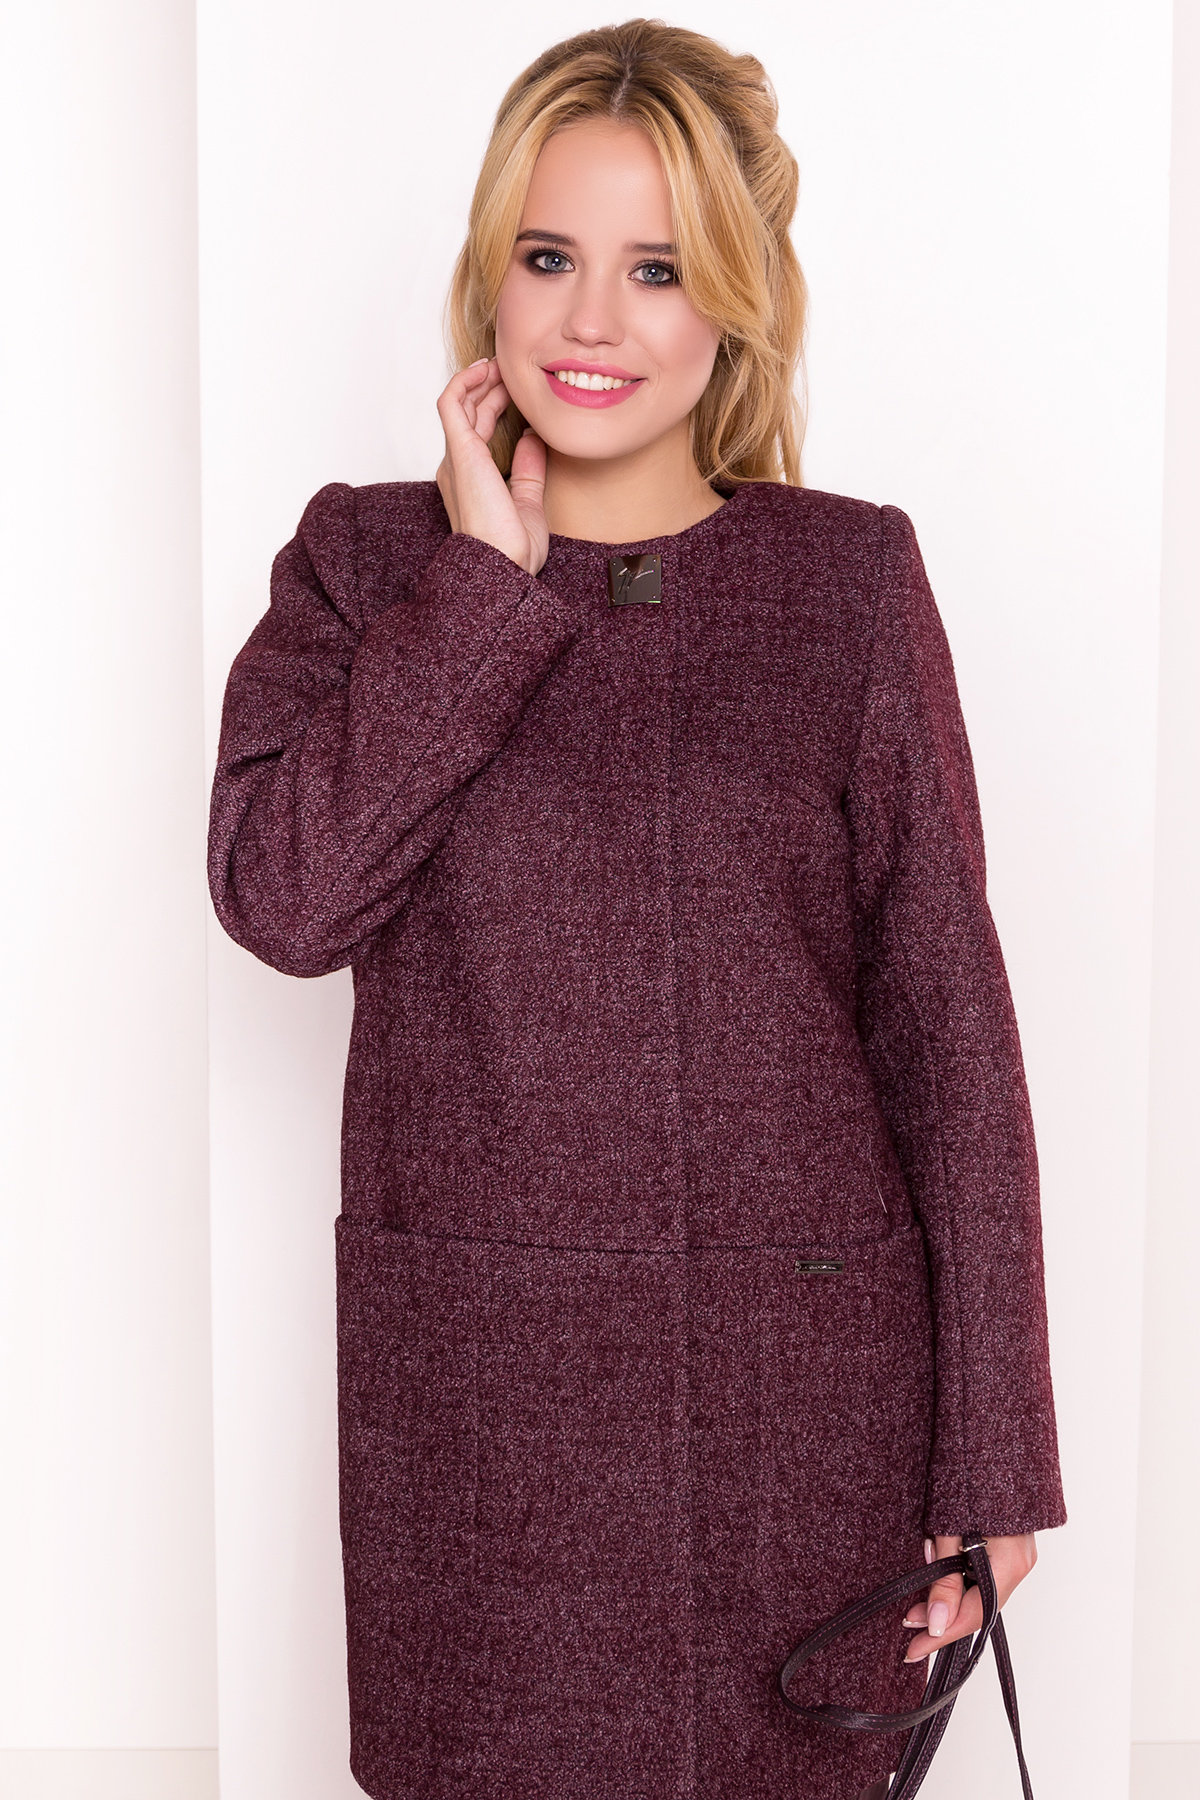 Пальто на весну Дакс 1679 АРТ. 16668 Цвет: Марсала - фото 3, интернет магазин tm-modus.ru